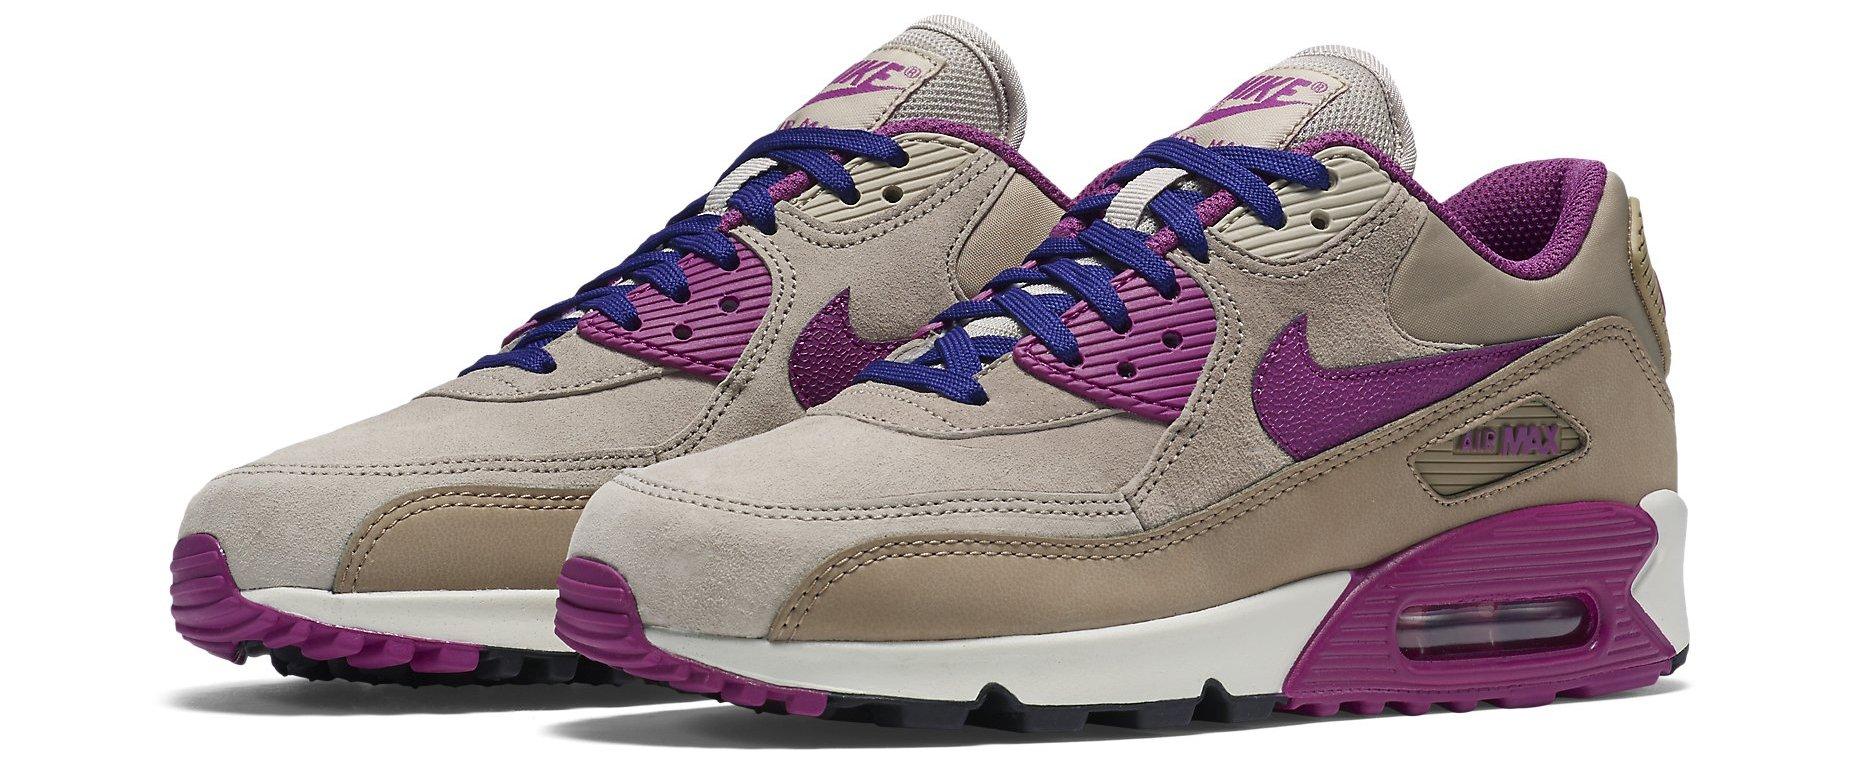 ... Dámské RXphOy6v Obuv Nike WMNS AIR MAX 90 LTHR ... e484b60094